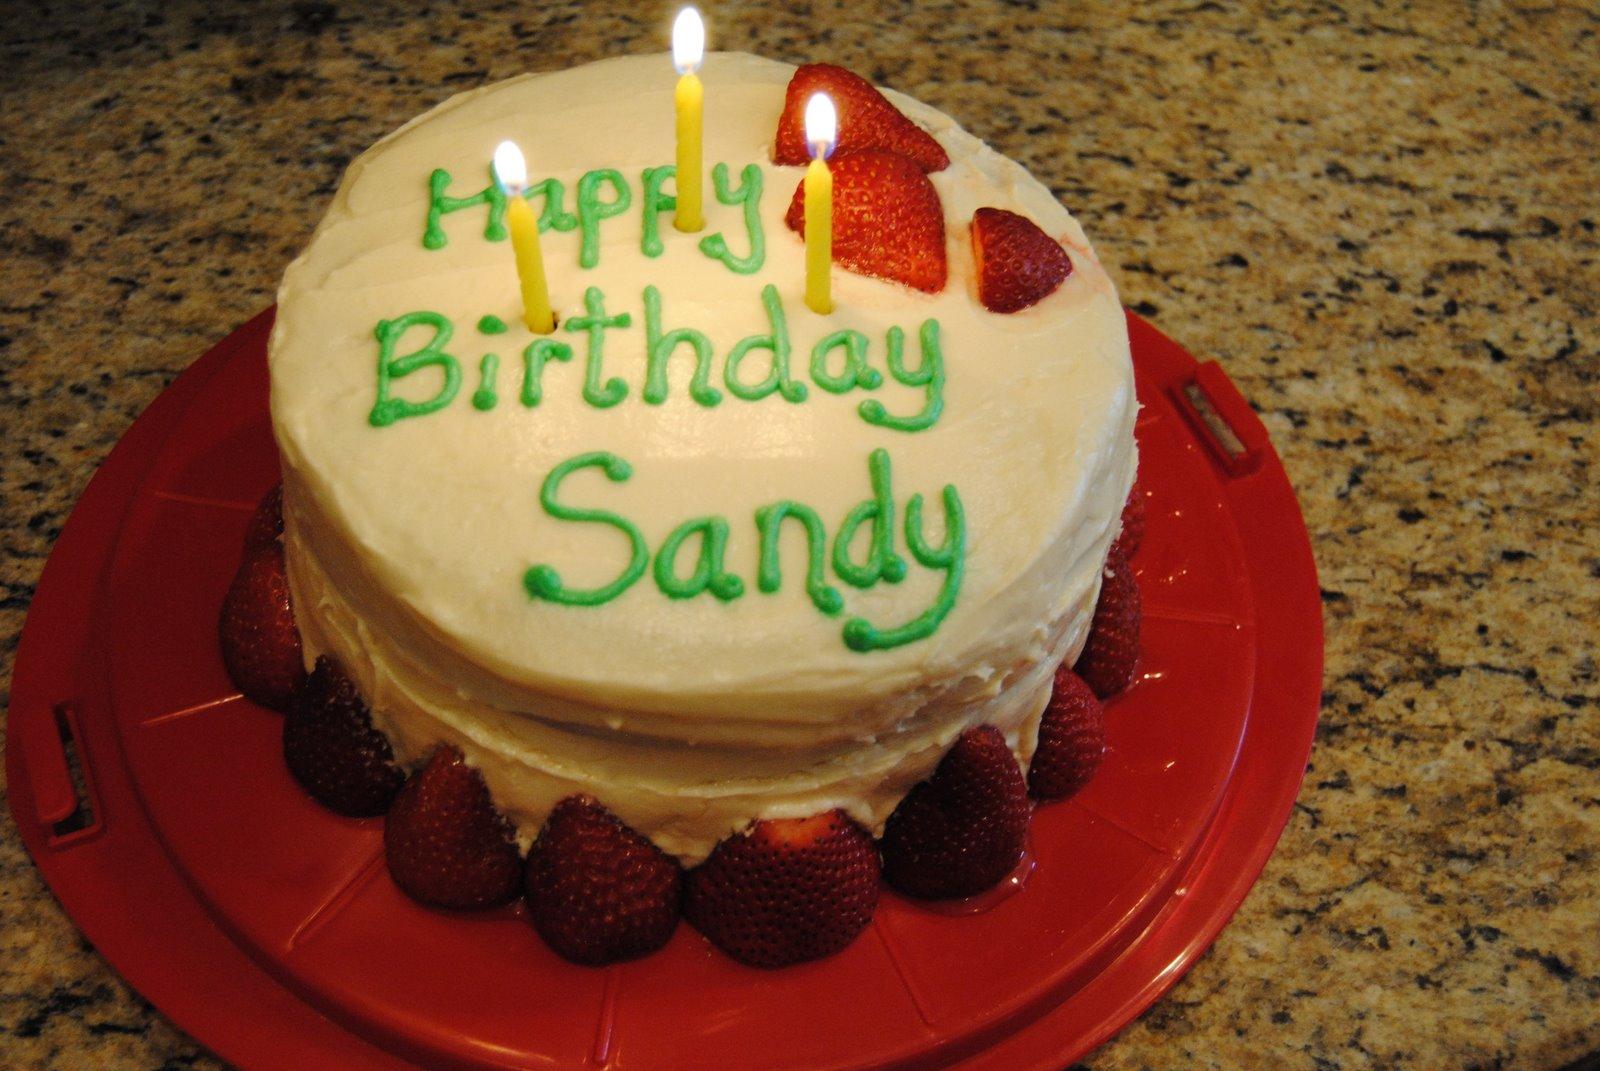 Happy Birthday Sandi Cake Images